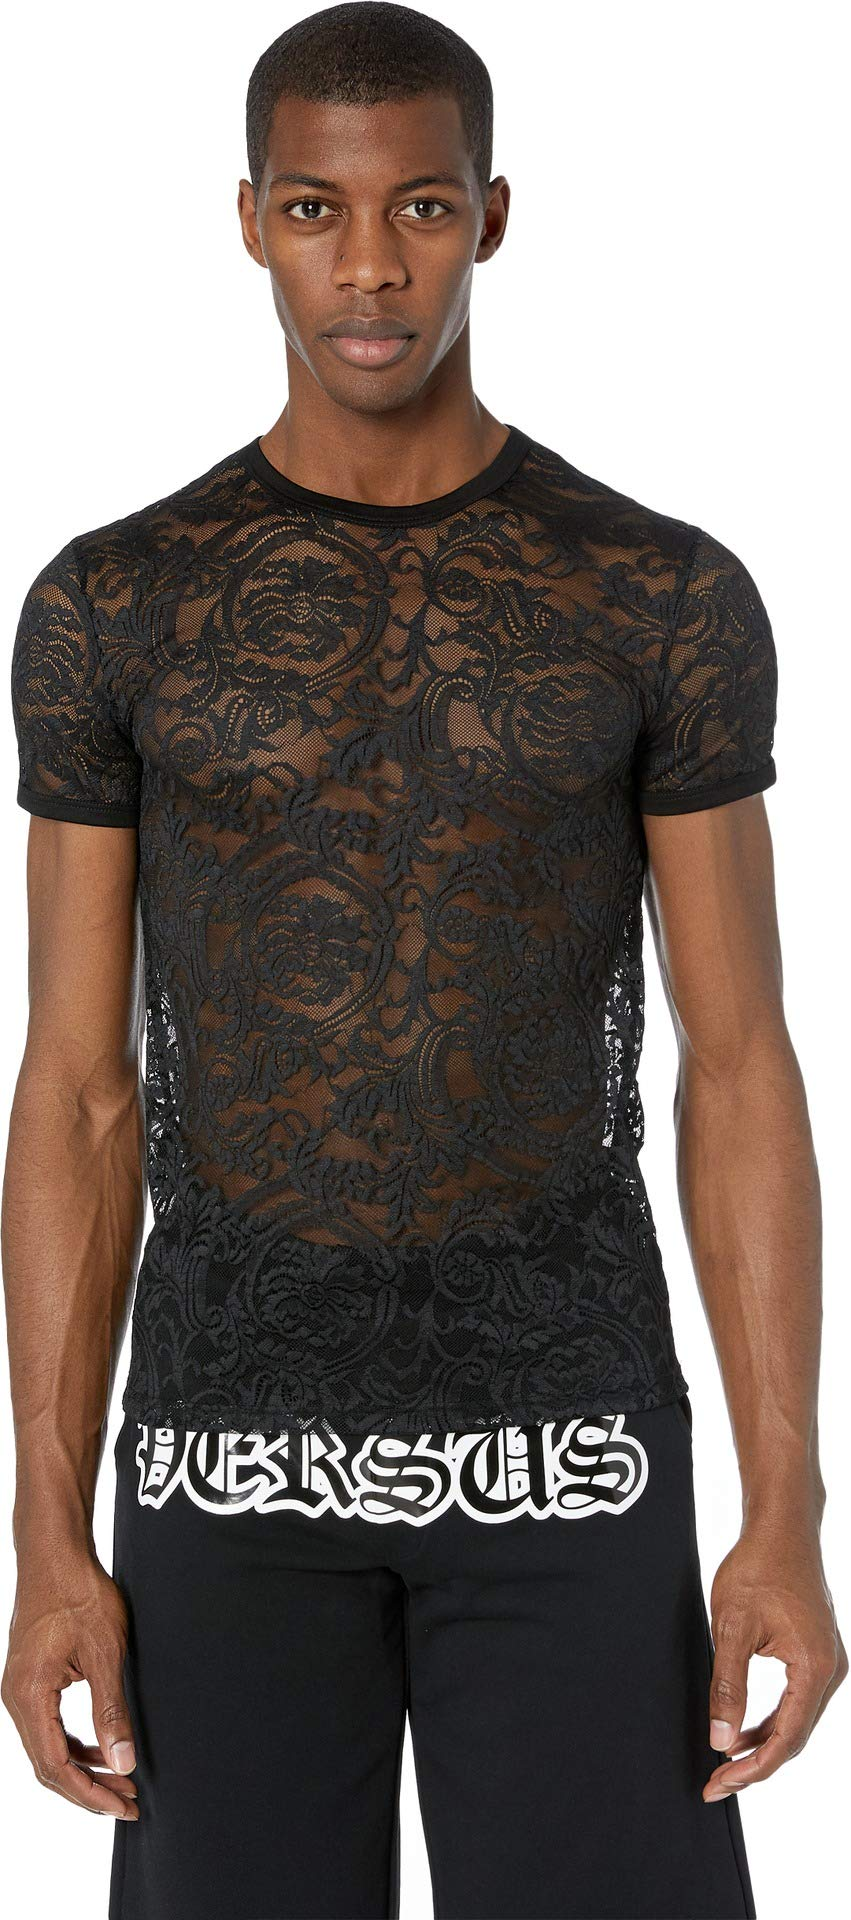 Versace Men's Underwear T-Shirt Black 6